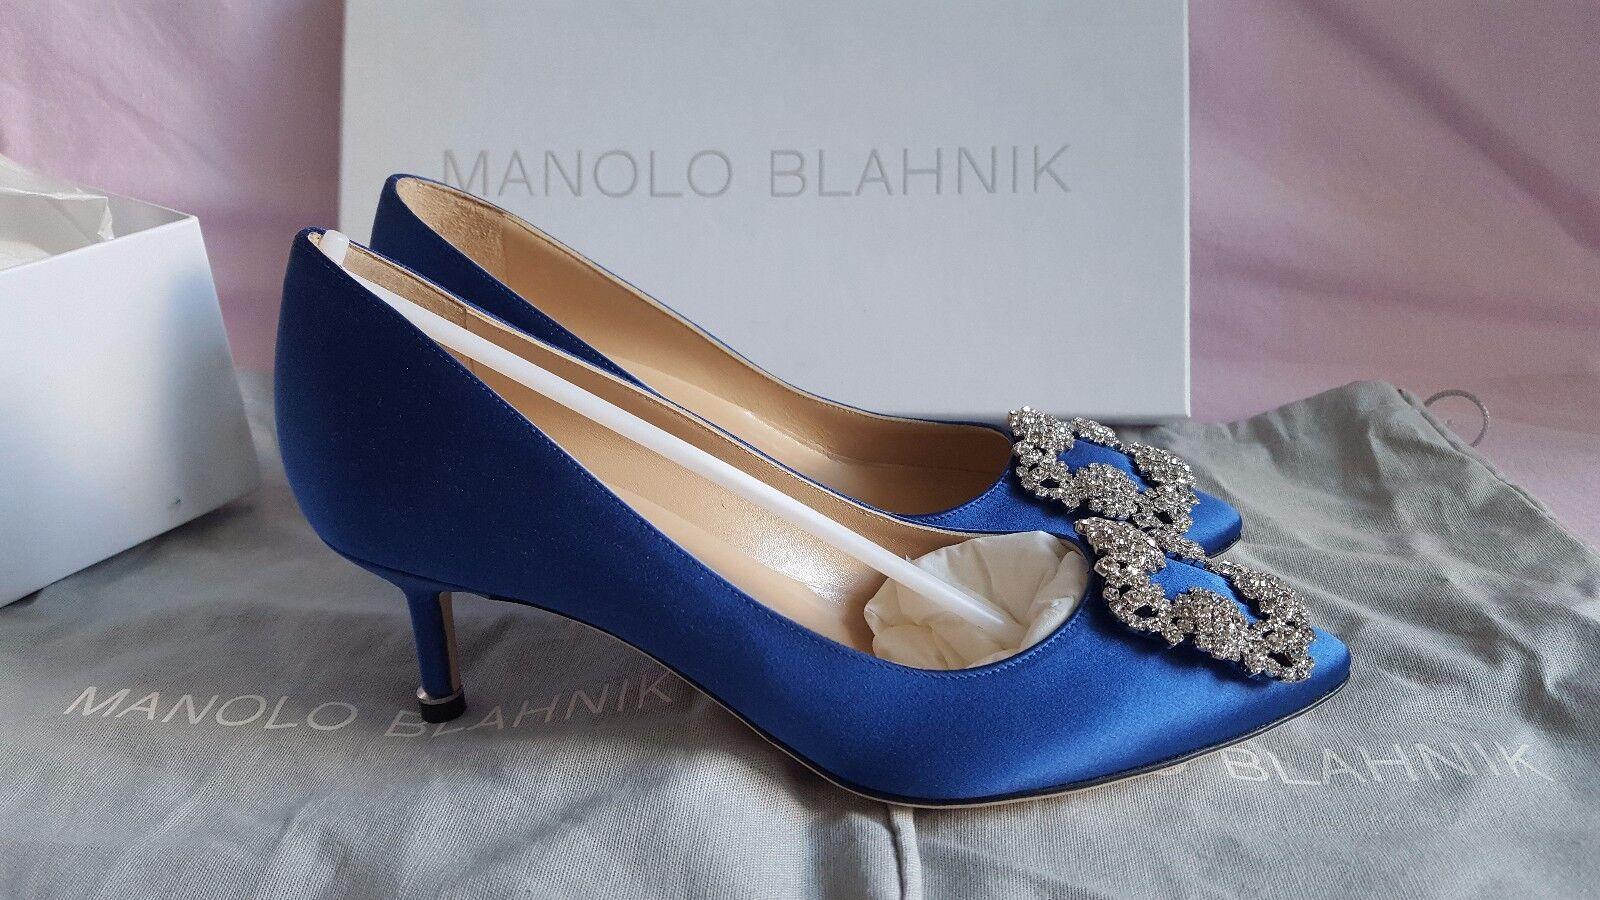 Nuovo autentico Manolo  Blahnik Hangisi 50 Royal blu Satin scarpe Heels Pump CLC  marchio in liquidazione